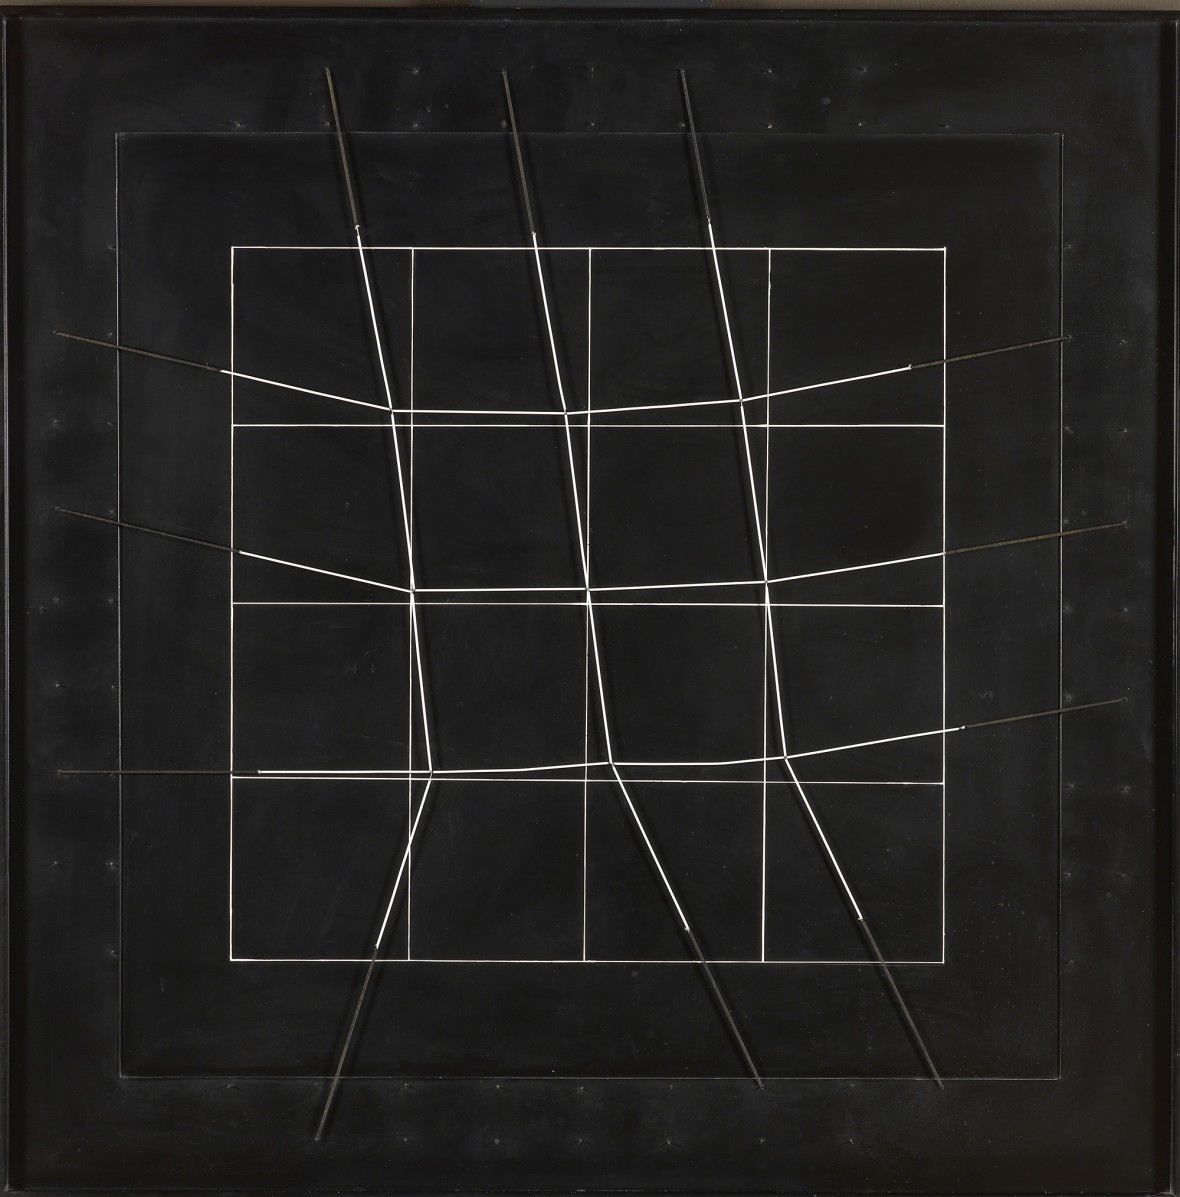 <p><b>Gianni Colombo,</b><i>Spazio elastico 16 doppi quadrati adiacenti- (intermutabile)</i> <i>[Elastic Space, 16 Adjacent Double Squares (Intermutable)]</i>, 1977</p><p></p>